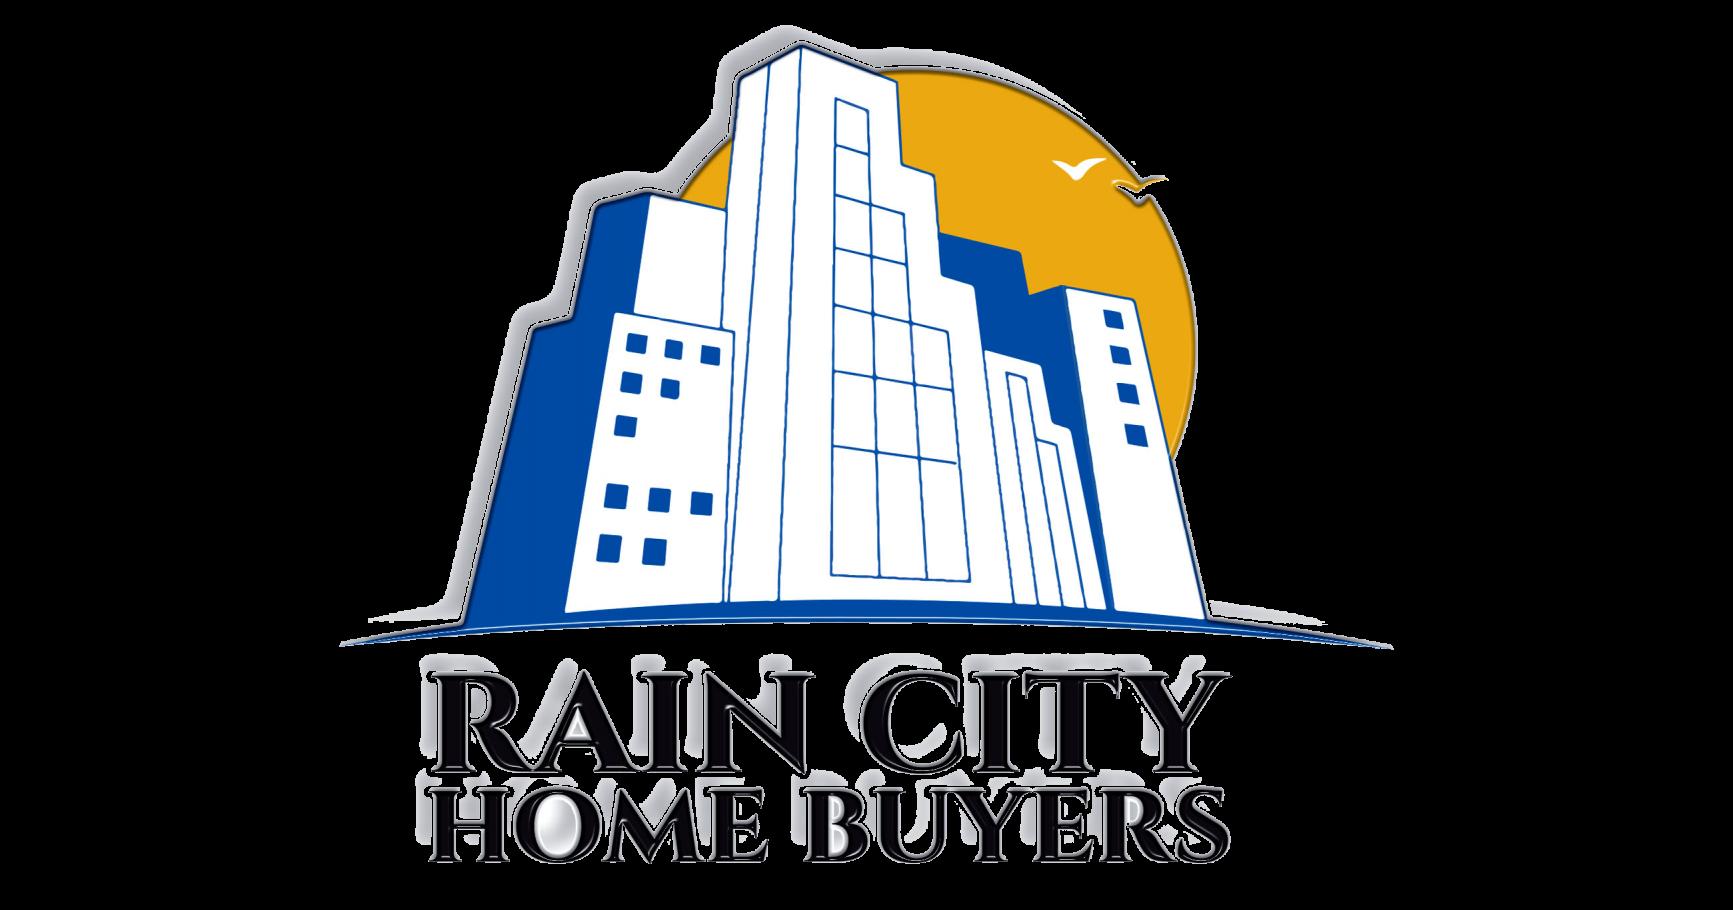 Rain City Home Buyers logo